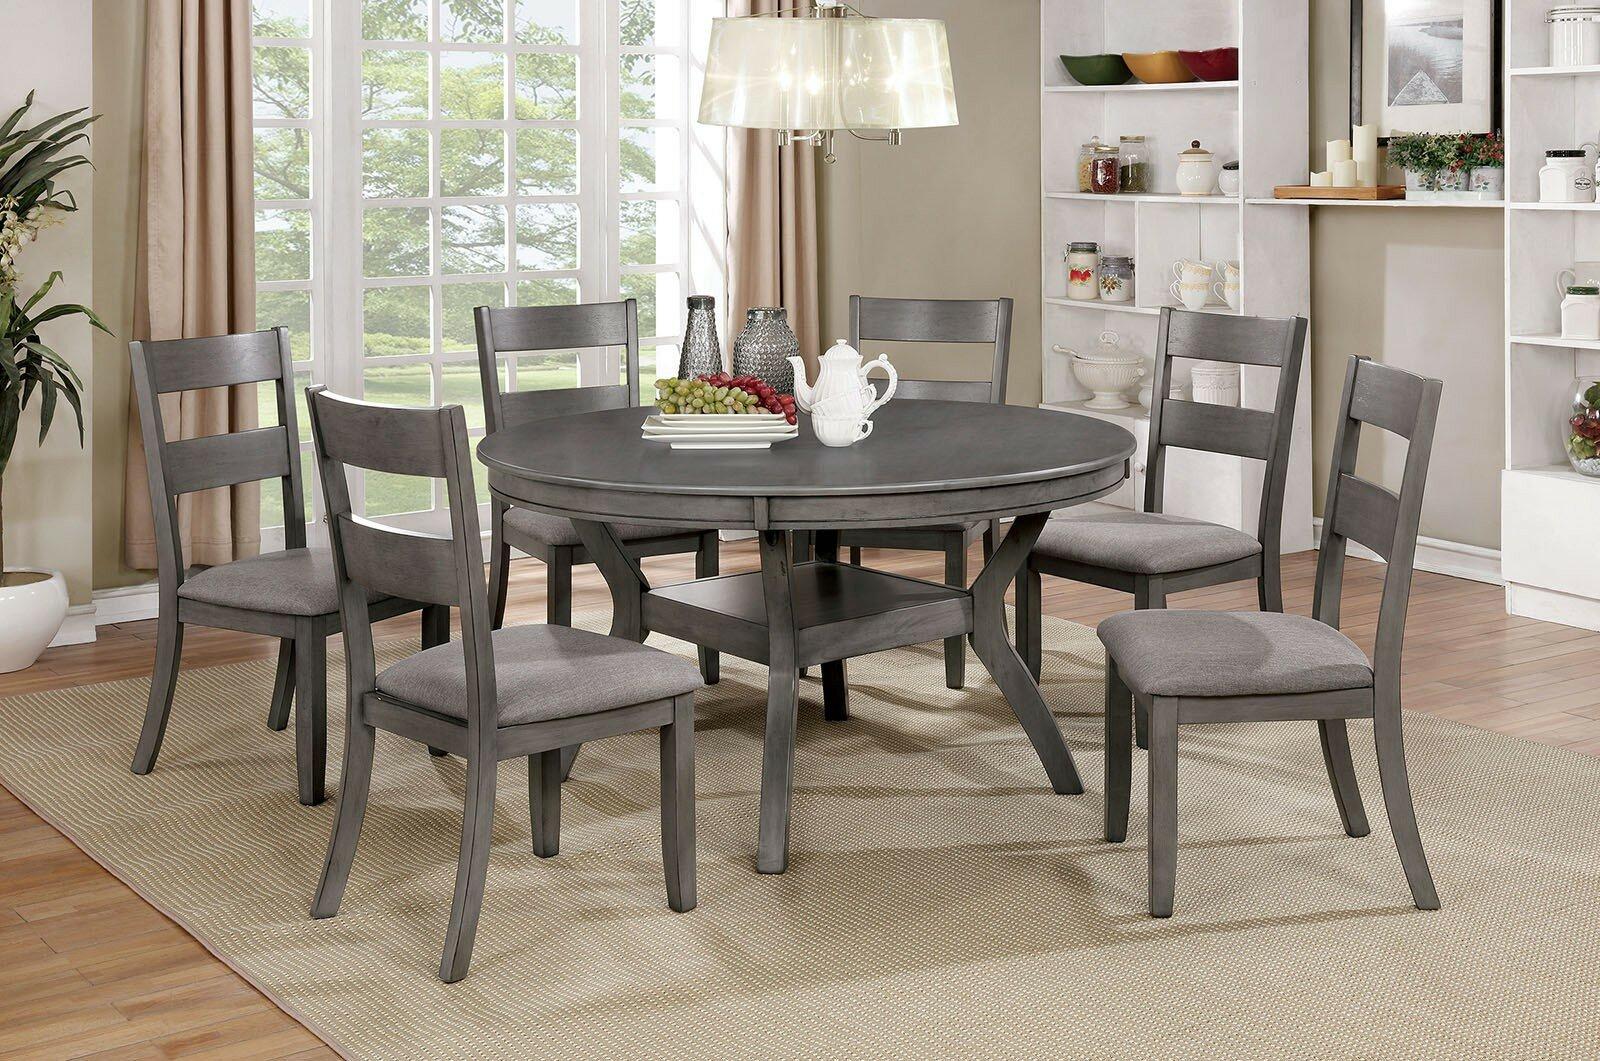 Longshore Tides Darryl Round Dining Table Reviews Wayfair